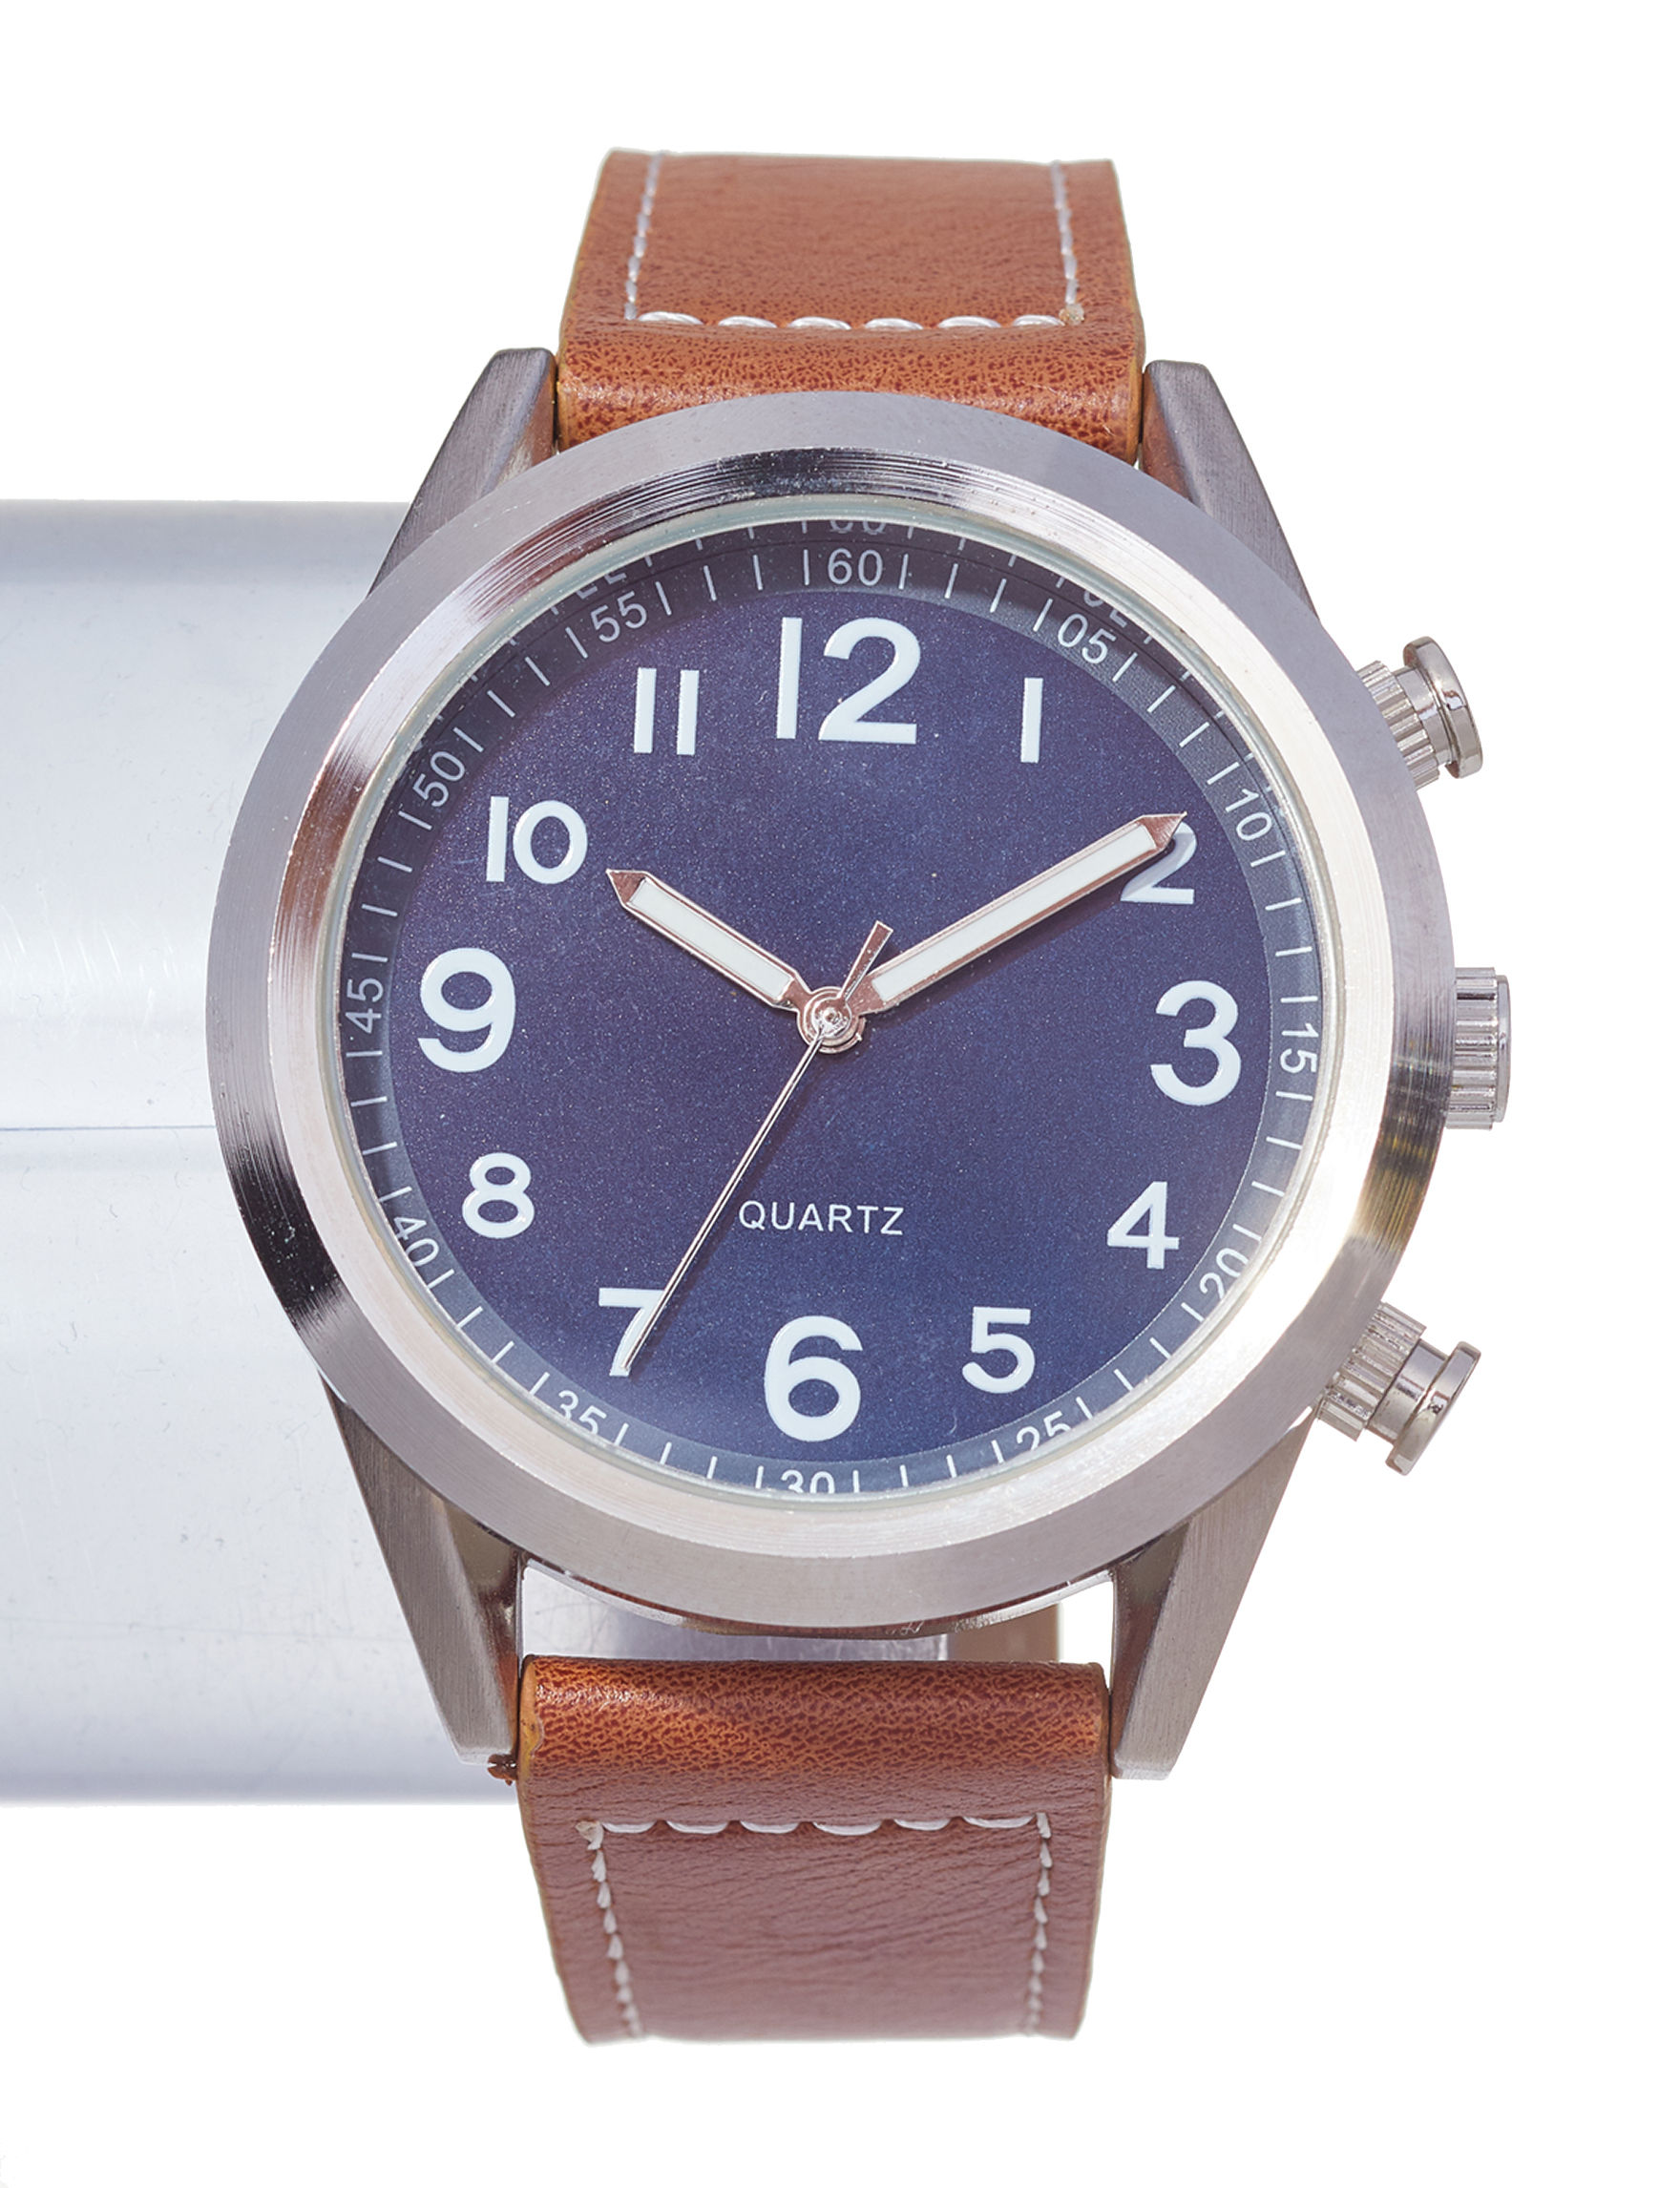 Accutime Silver Fashion Watches